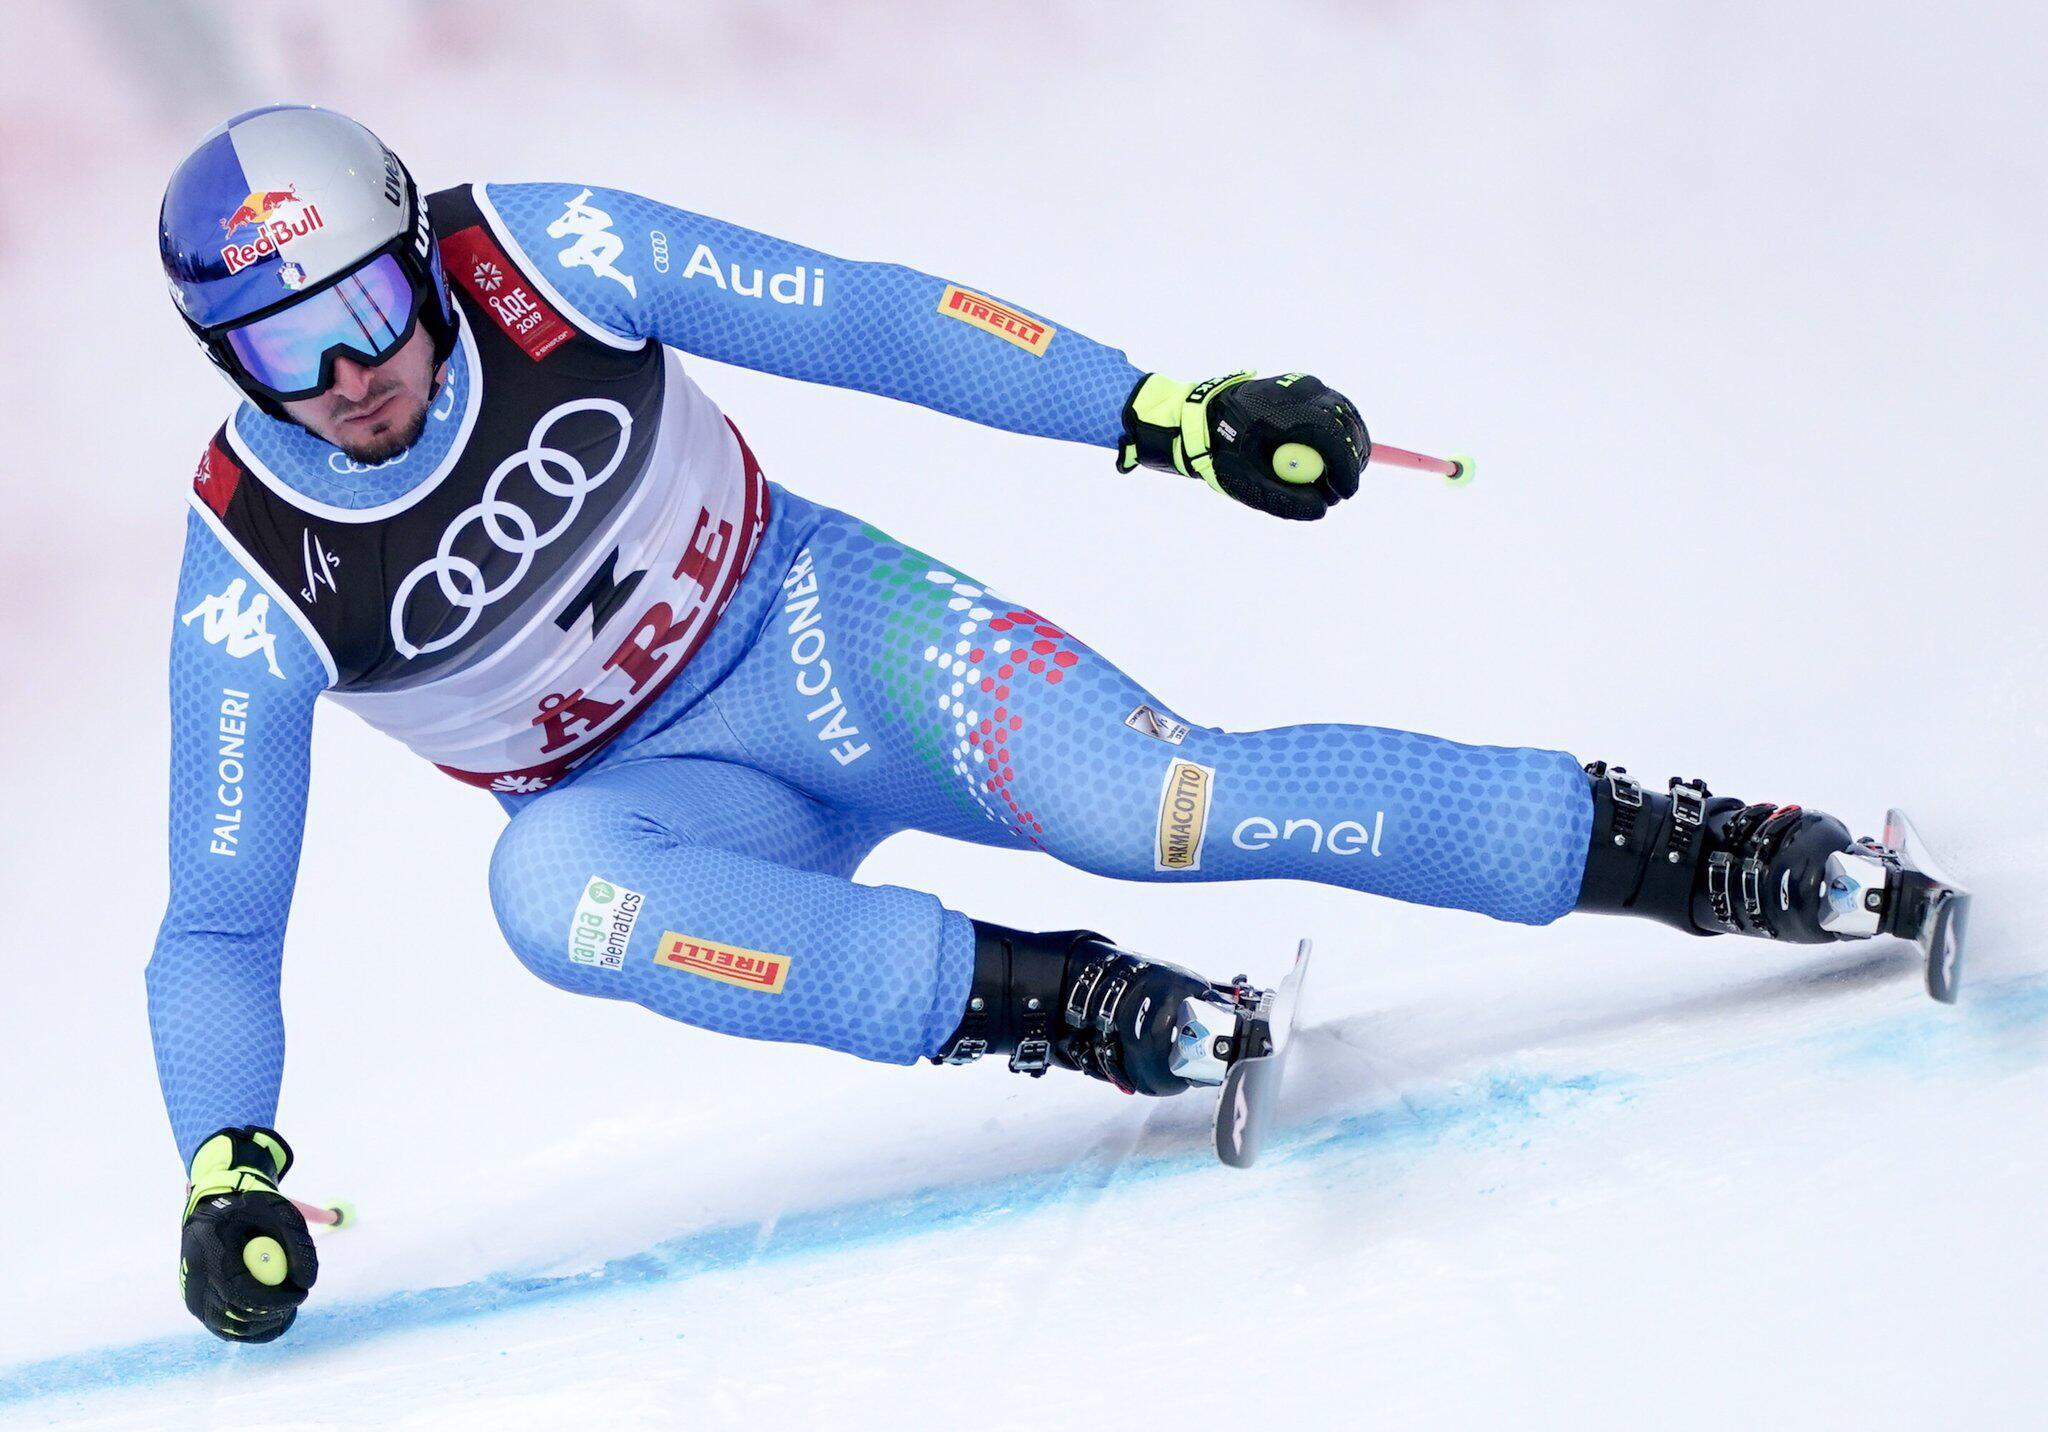 Bild zu Ski alpin, WM, Are, Dominik Paris, Super-G